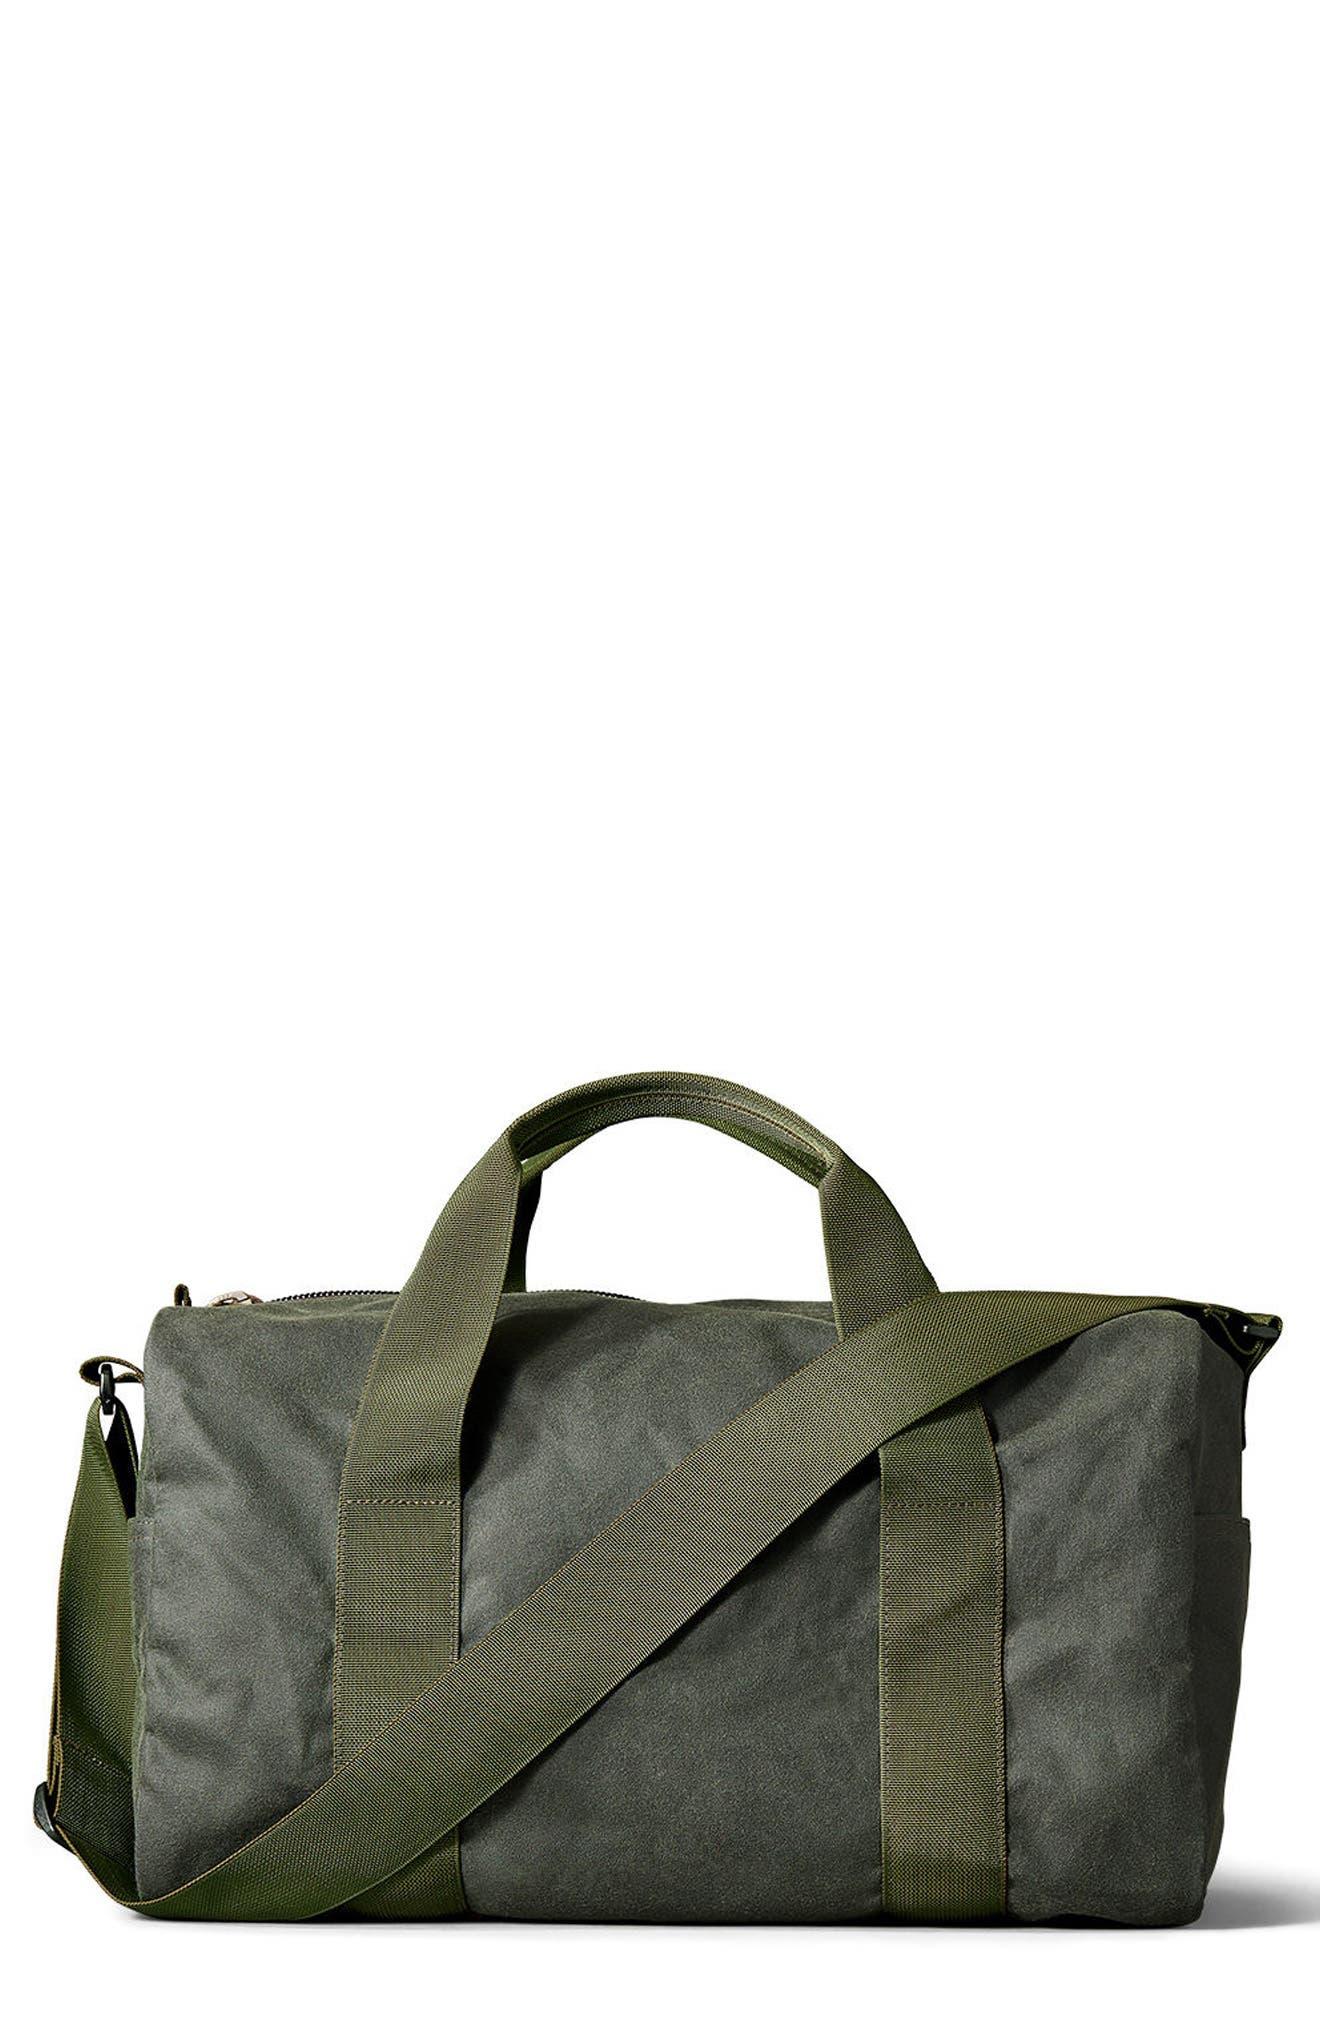 Small Field Duffel Bag,                             Main thumbnail 1, color,                             Spruce